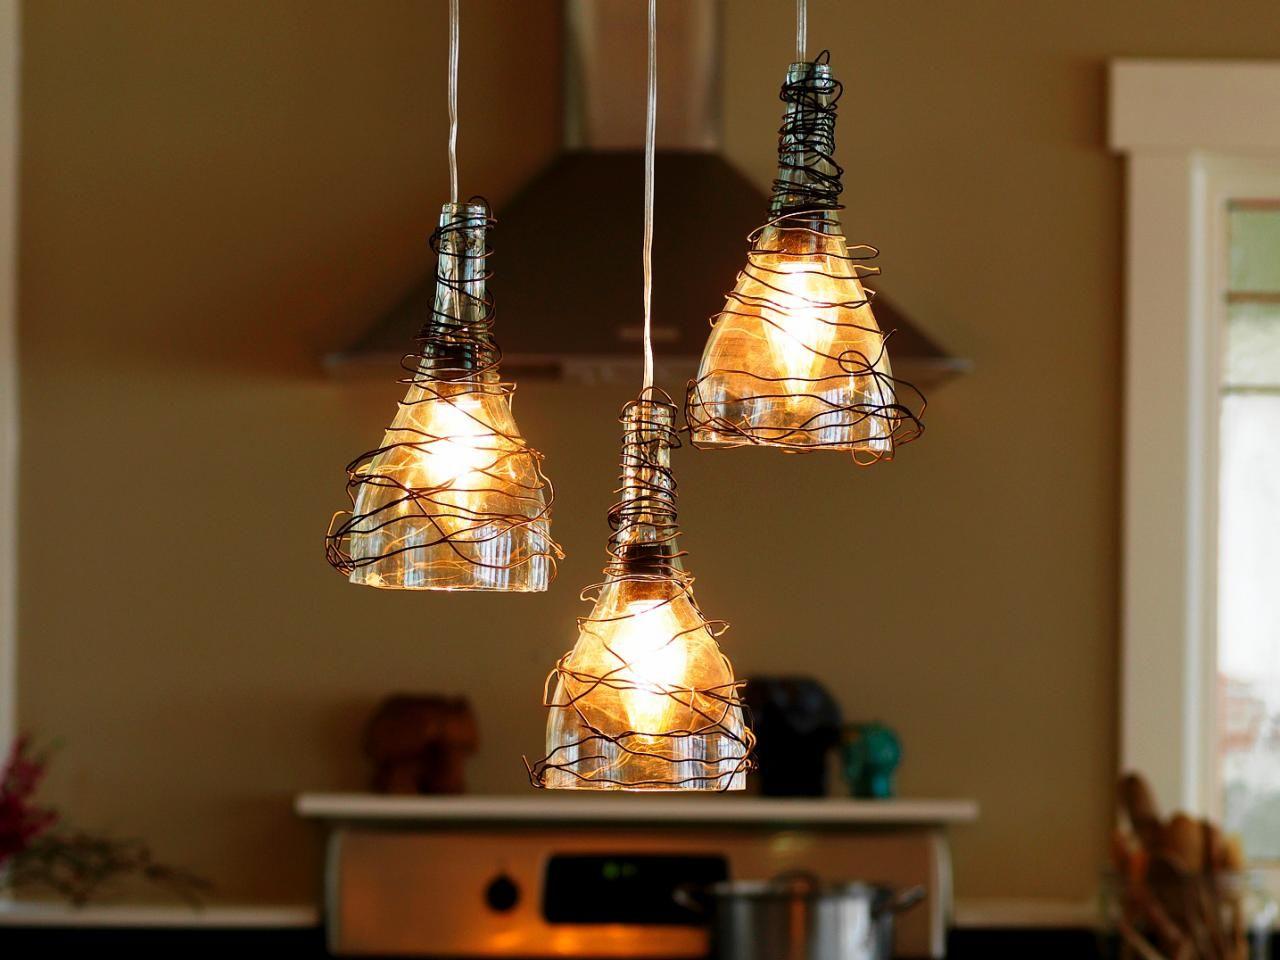 11 Fun Ways To Decorate With Mason Jars And Wine Bottles Diy Chandelier Diy Pendant Light Bottle Pendant Light